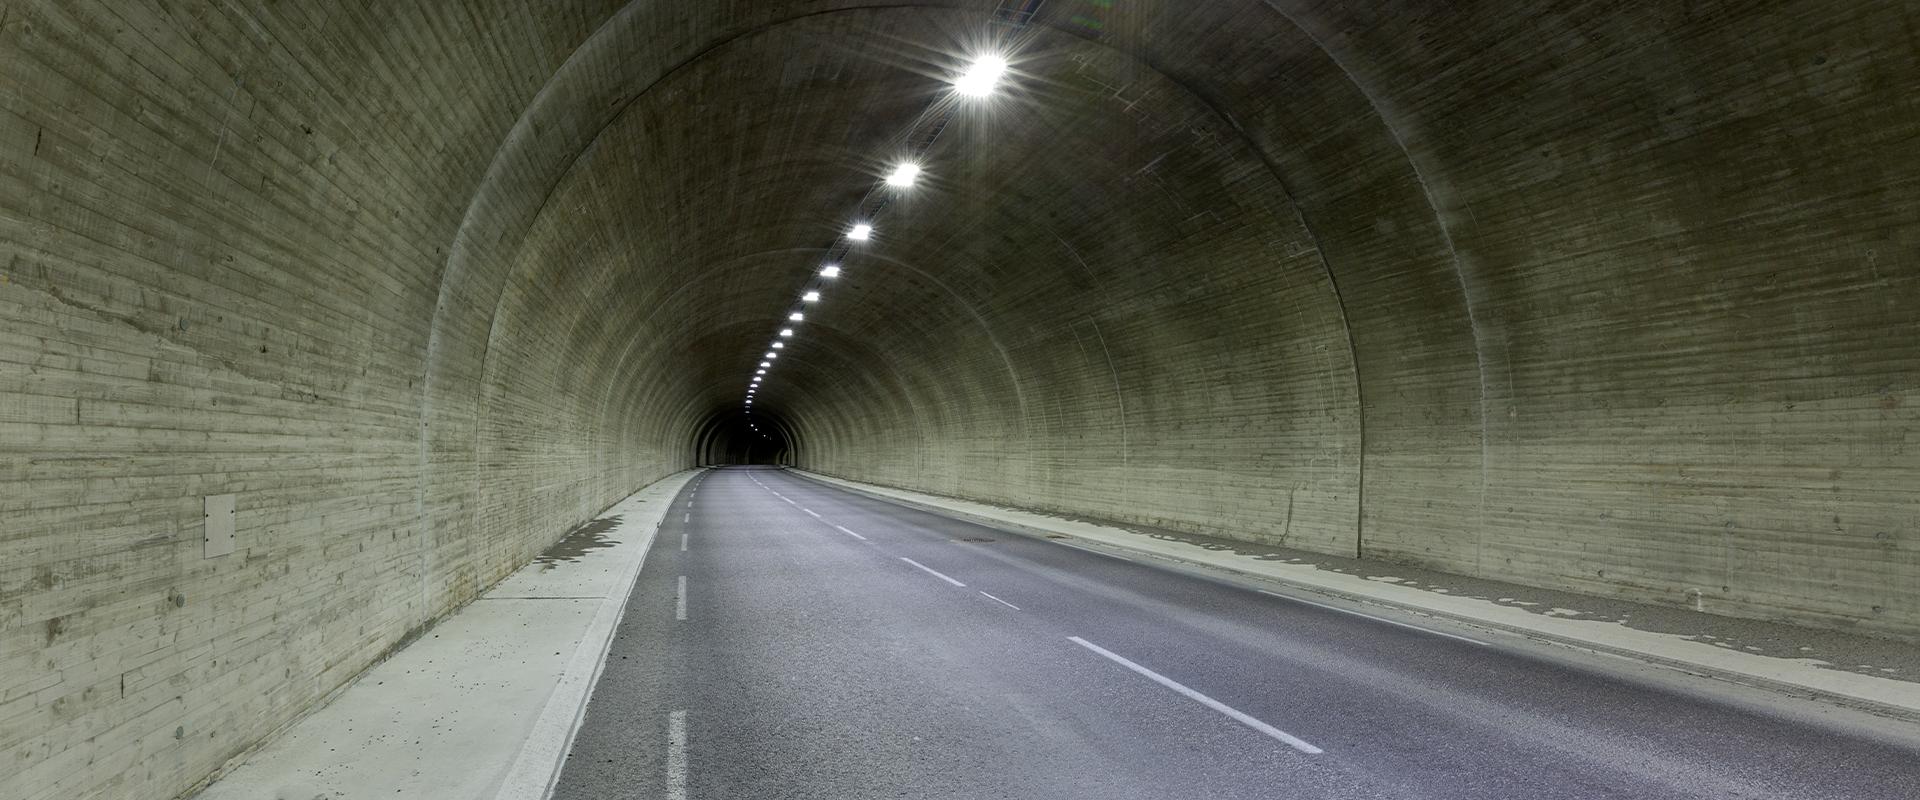 Illuminazione stradale a LED